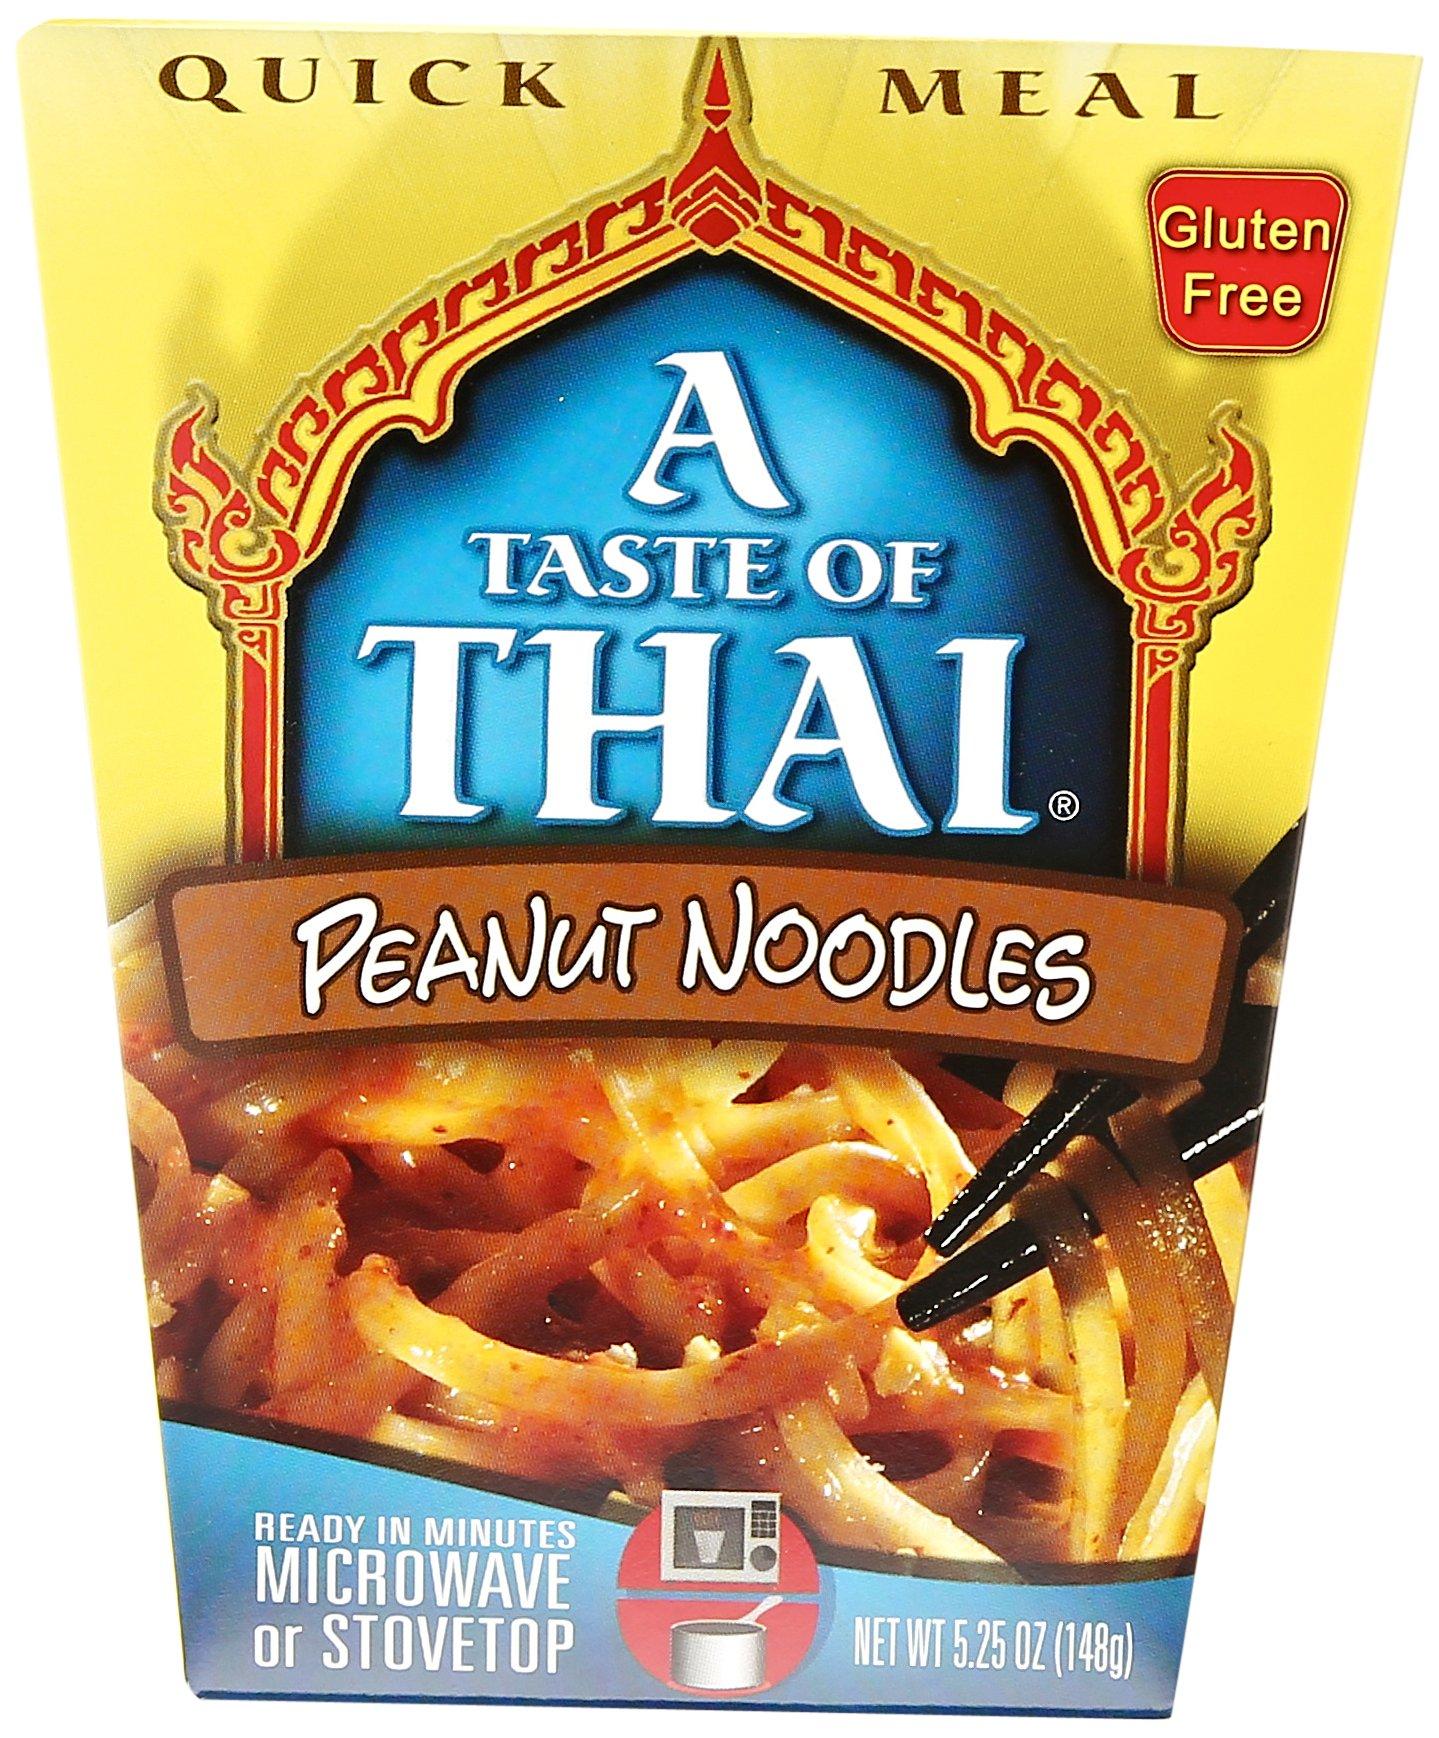 Taste Of Thai Peanut Noodles Quick Meal, 5.25 oz by A Taste of Thai